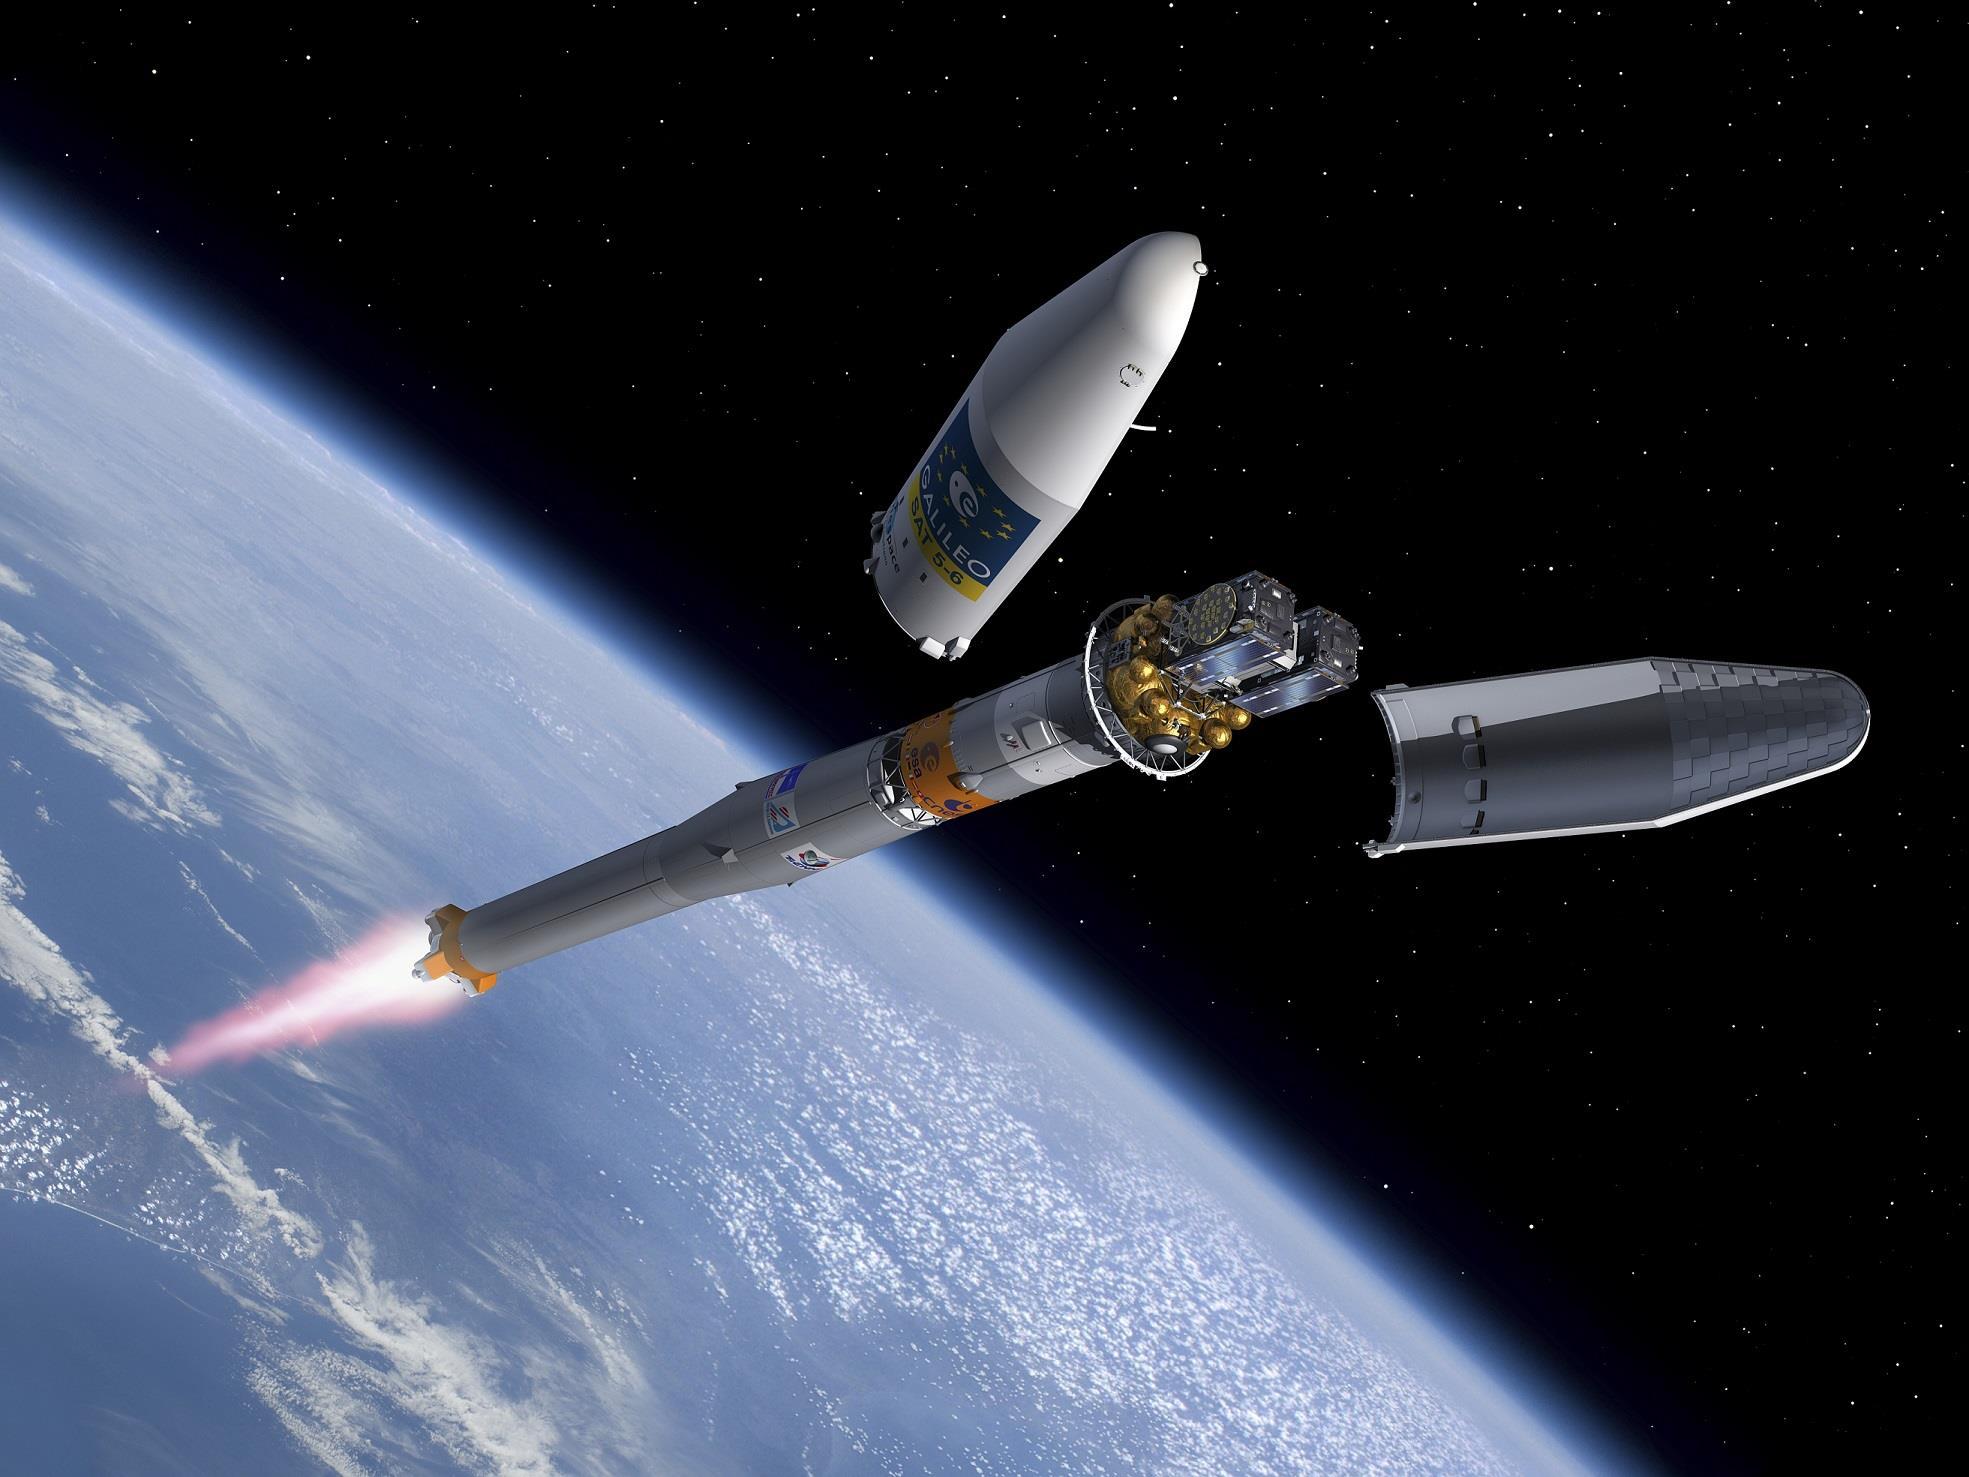 Ariane 5 lance quatre nouveaux satellites de Galileo jeudi